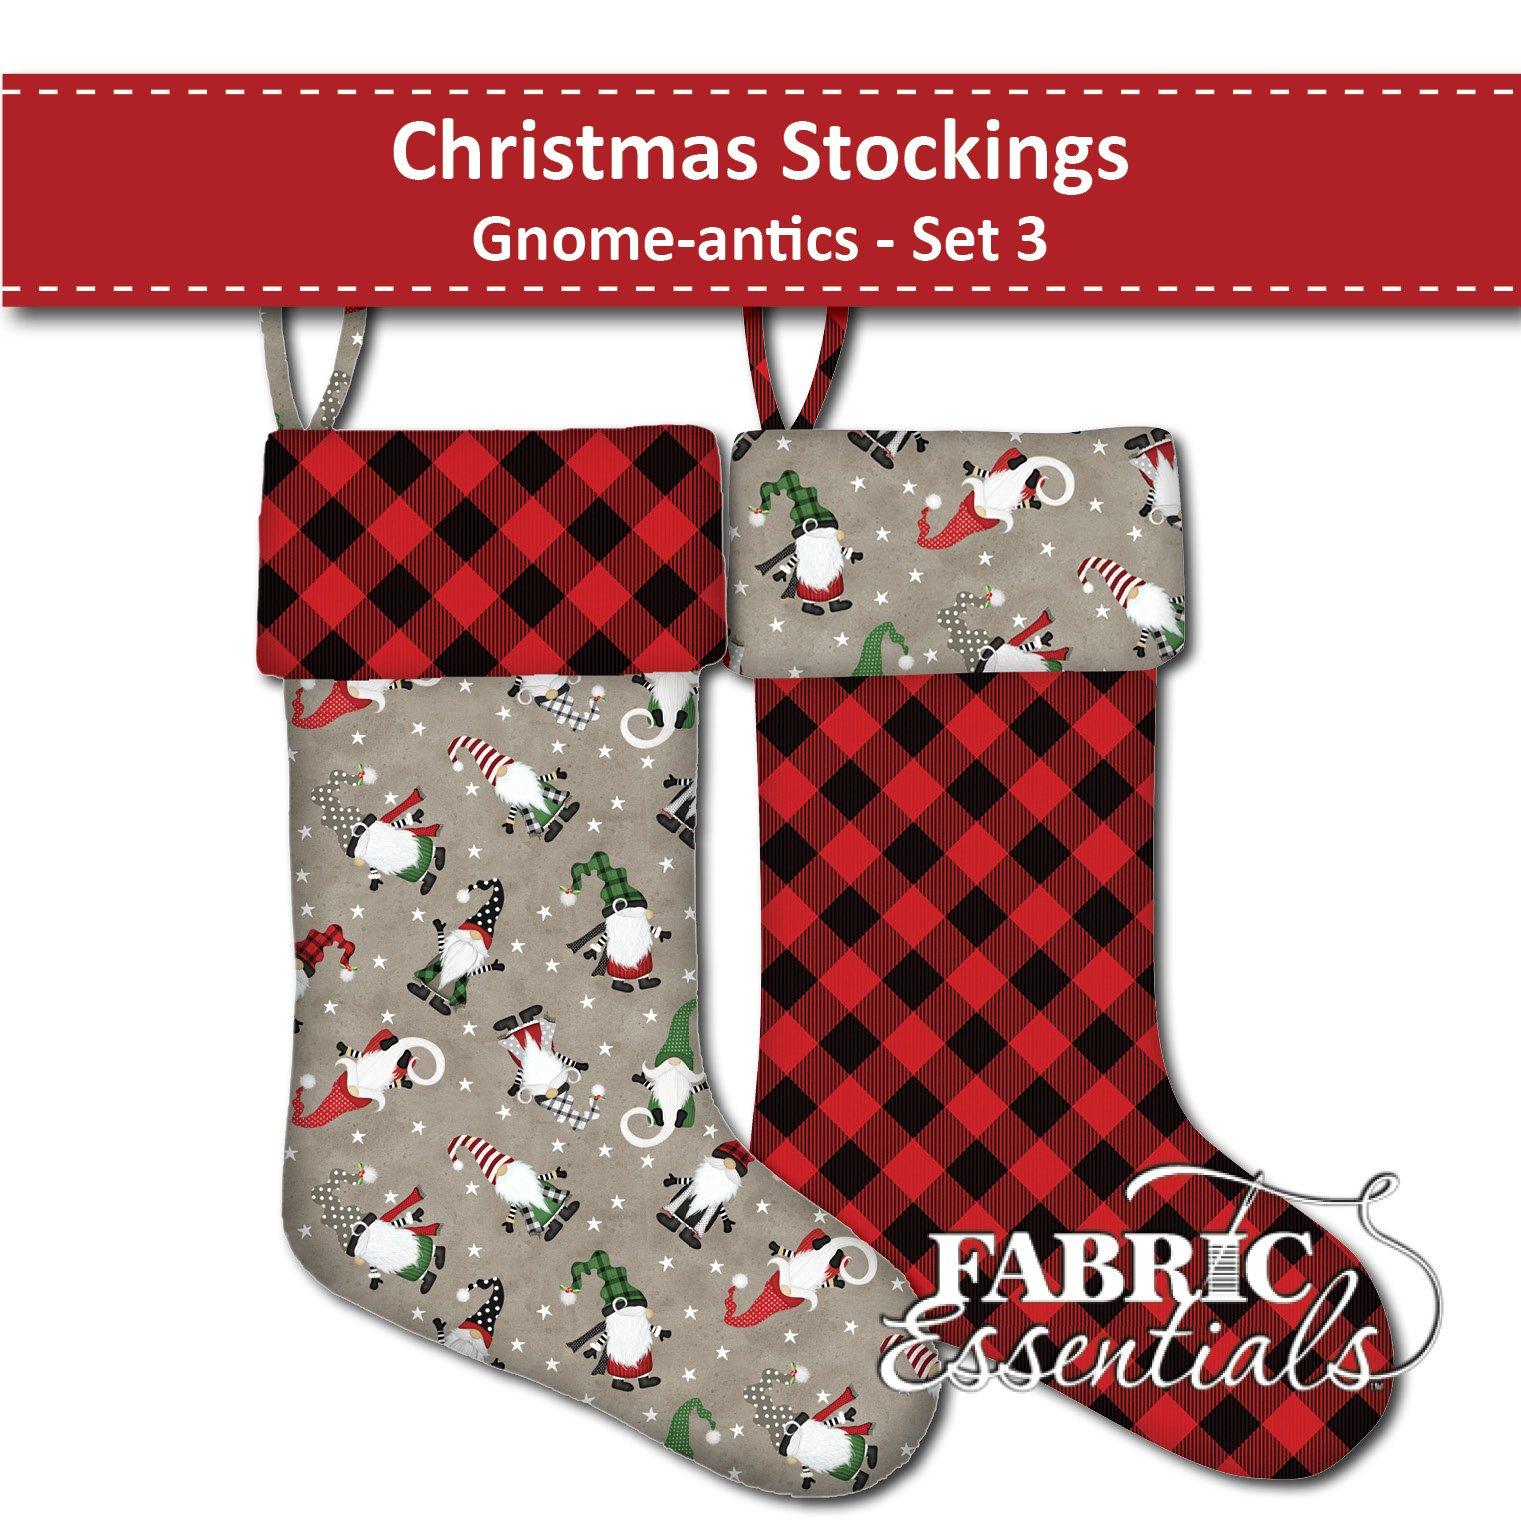 Gnome-antics - Christmas Stockings - Set 3